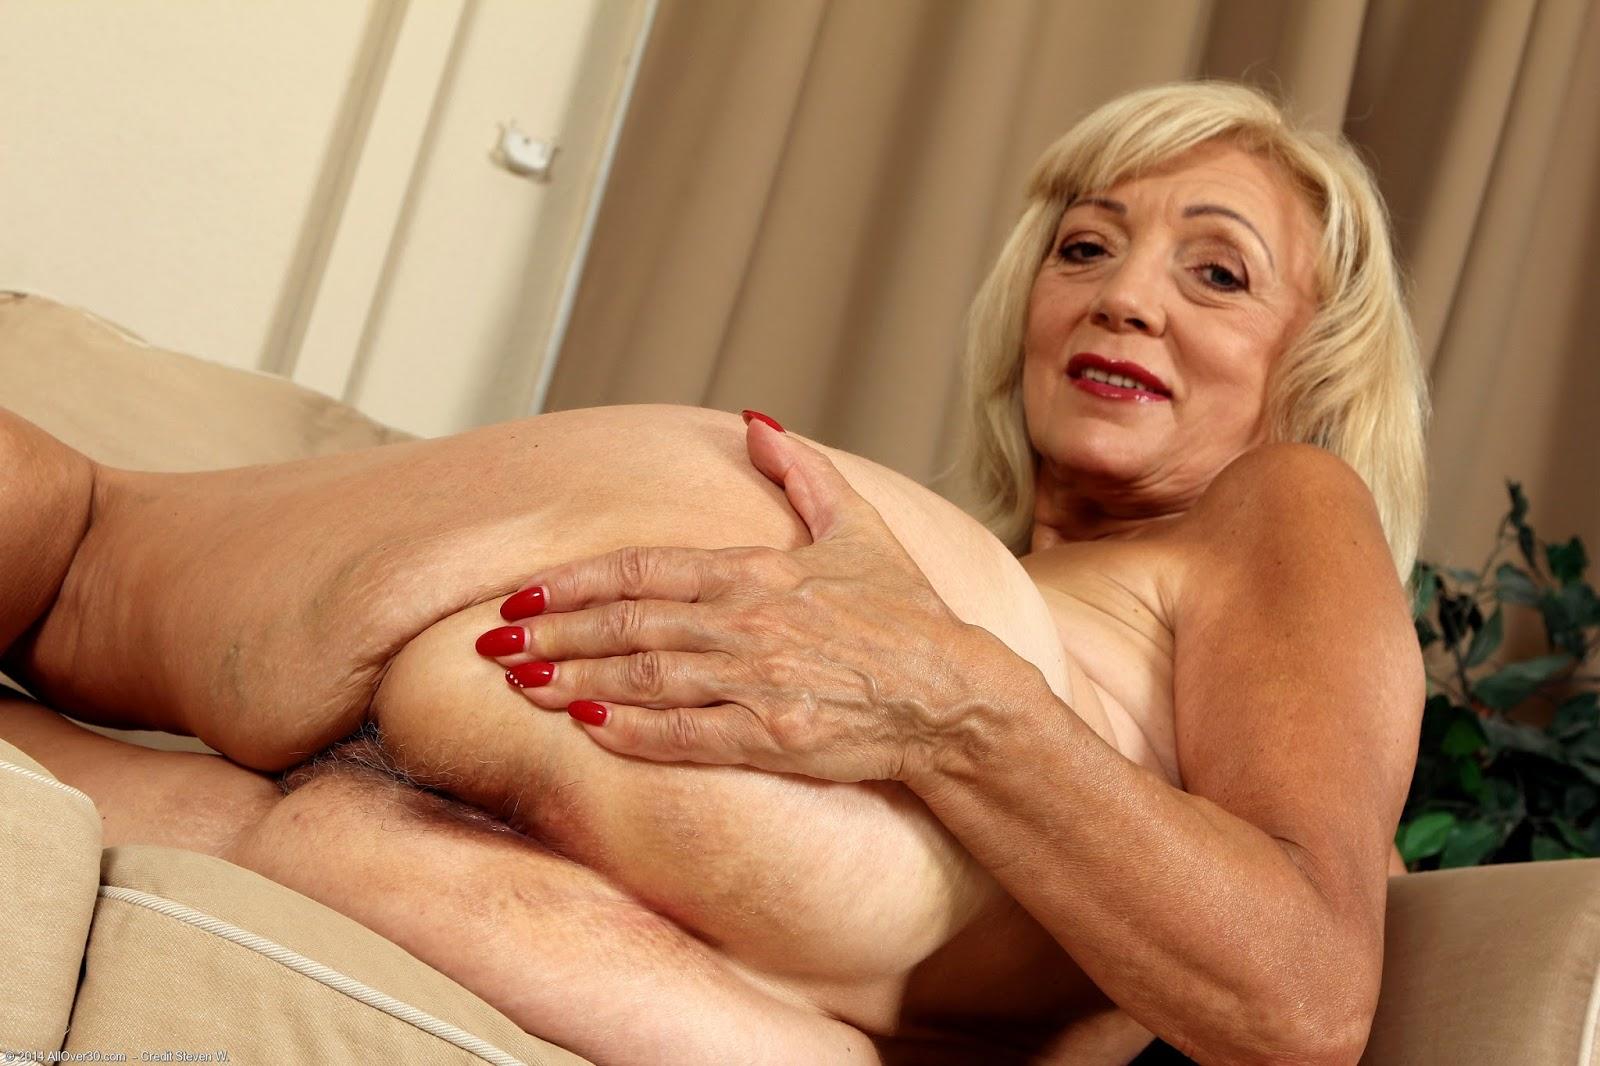 Perfect tits nude gif